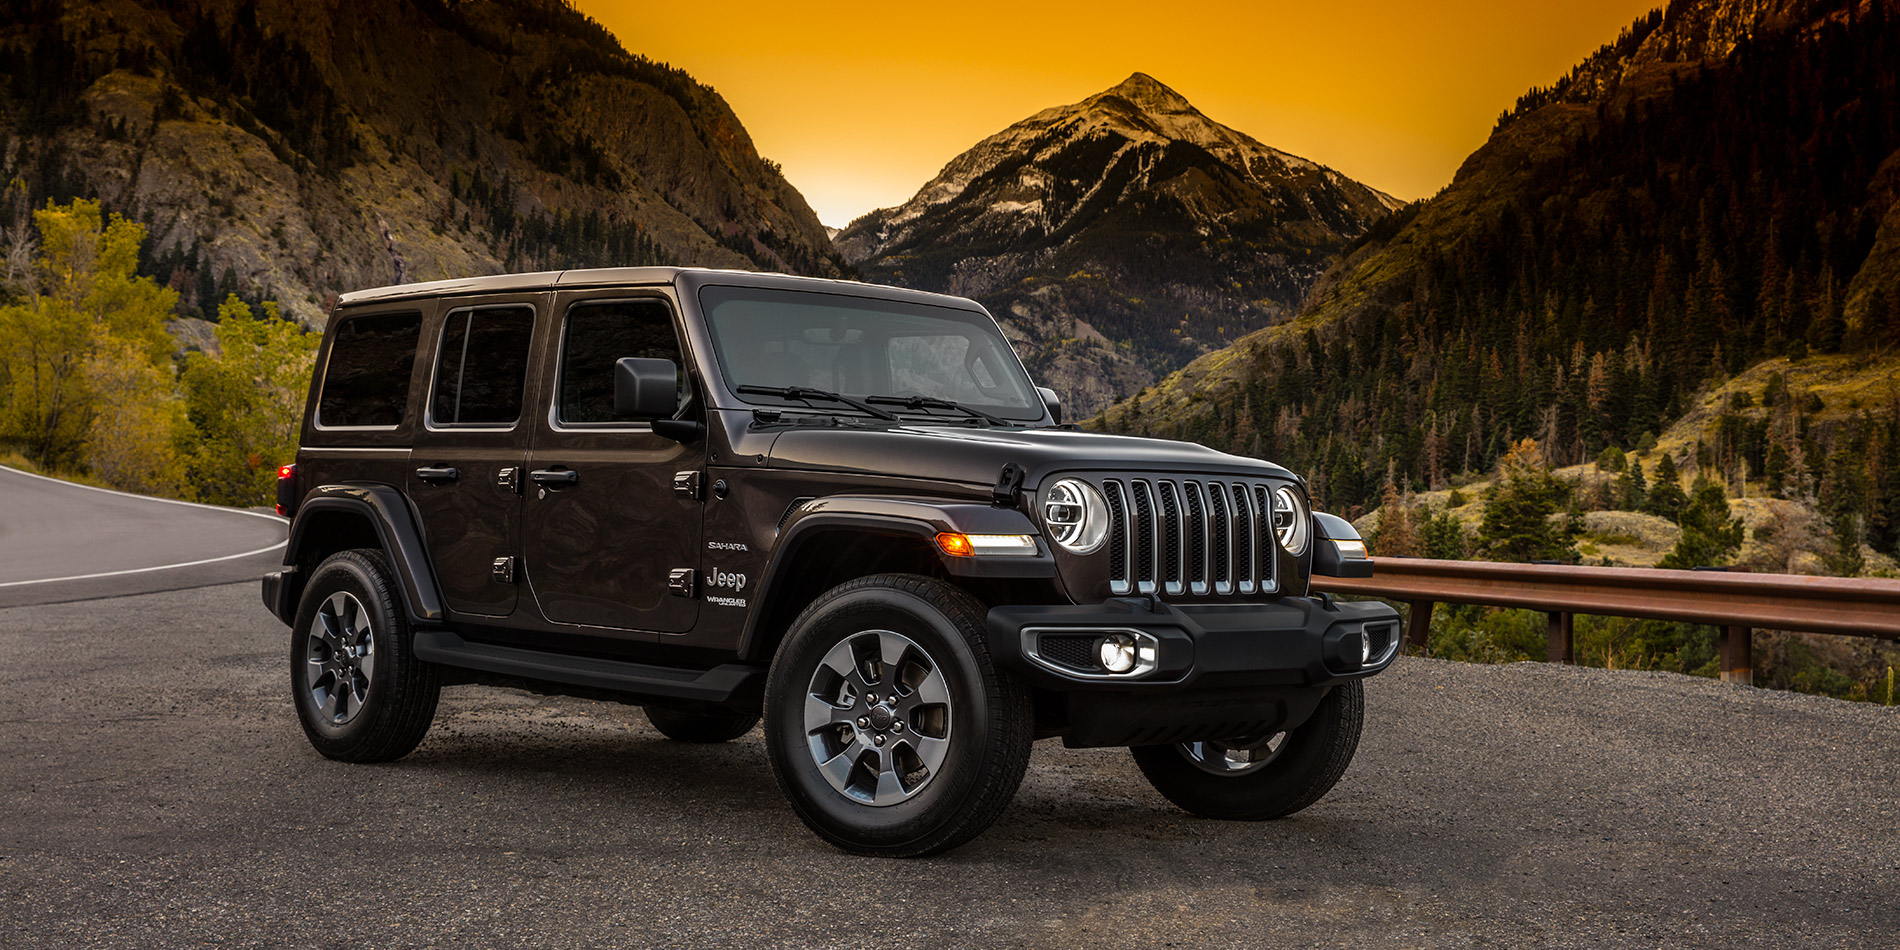 jeep-wrangler-4.jpg